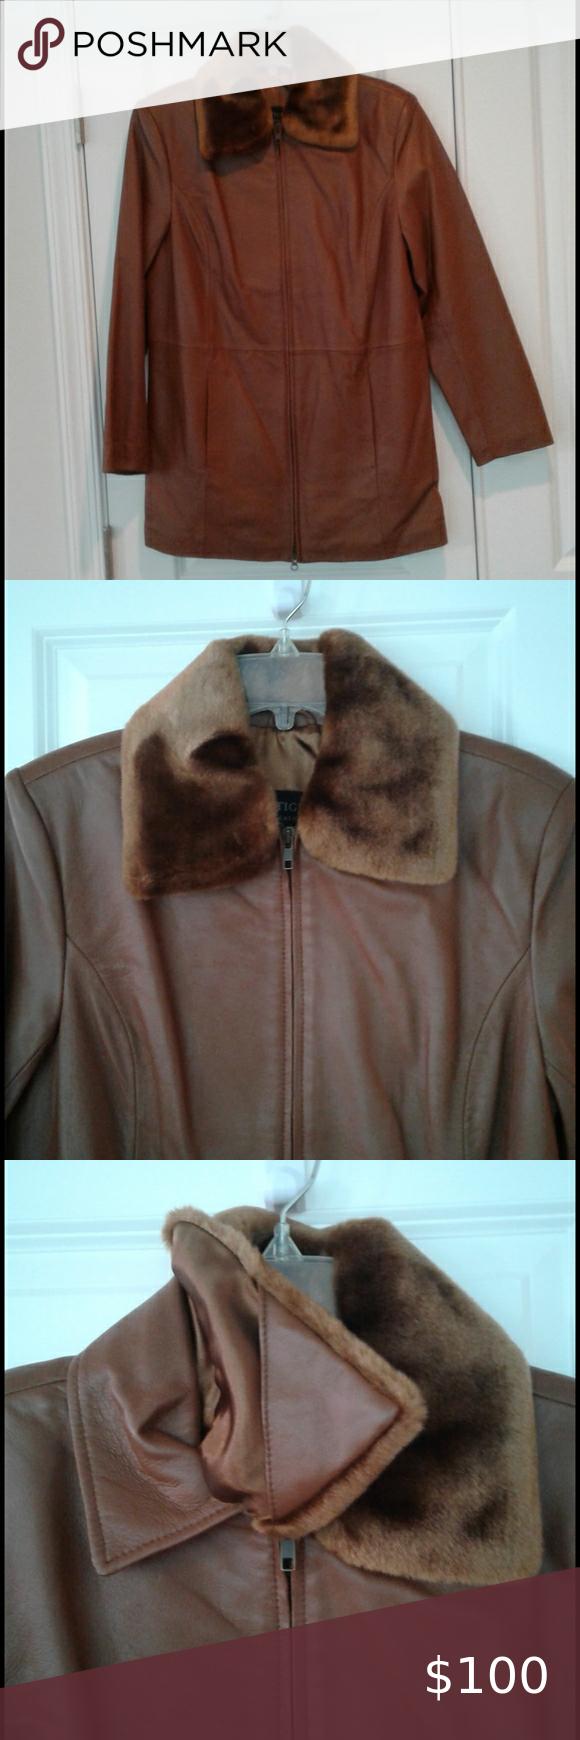 Centigrade Brown Leather Faux Fur Coat Size Xs In 2020 Leather Faux Fur Coat Faux Fur Coat Fur Collar Jacket [ 1740 x 580 Pixel ]